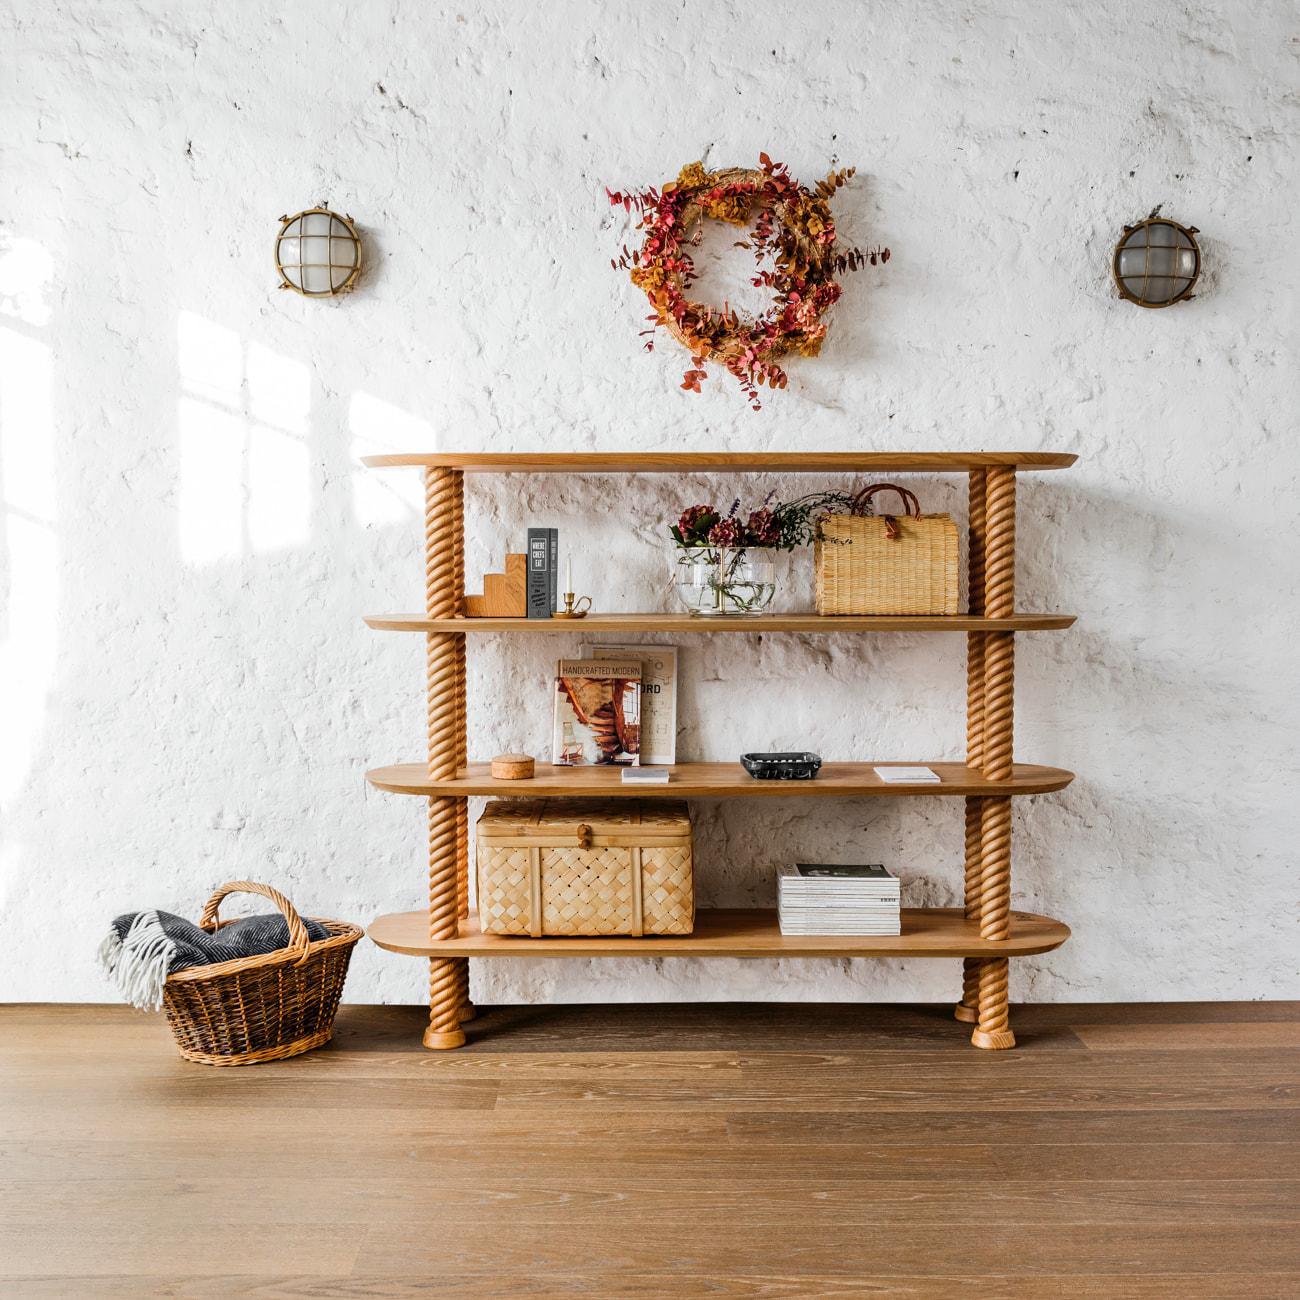 furniture-remix-rope-shelf-the-hansen-family-1